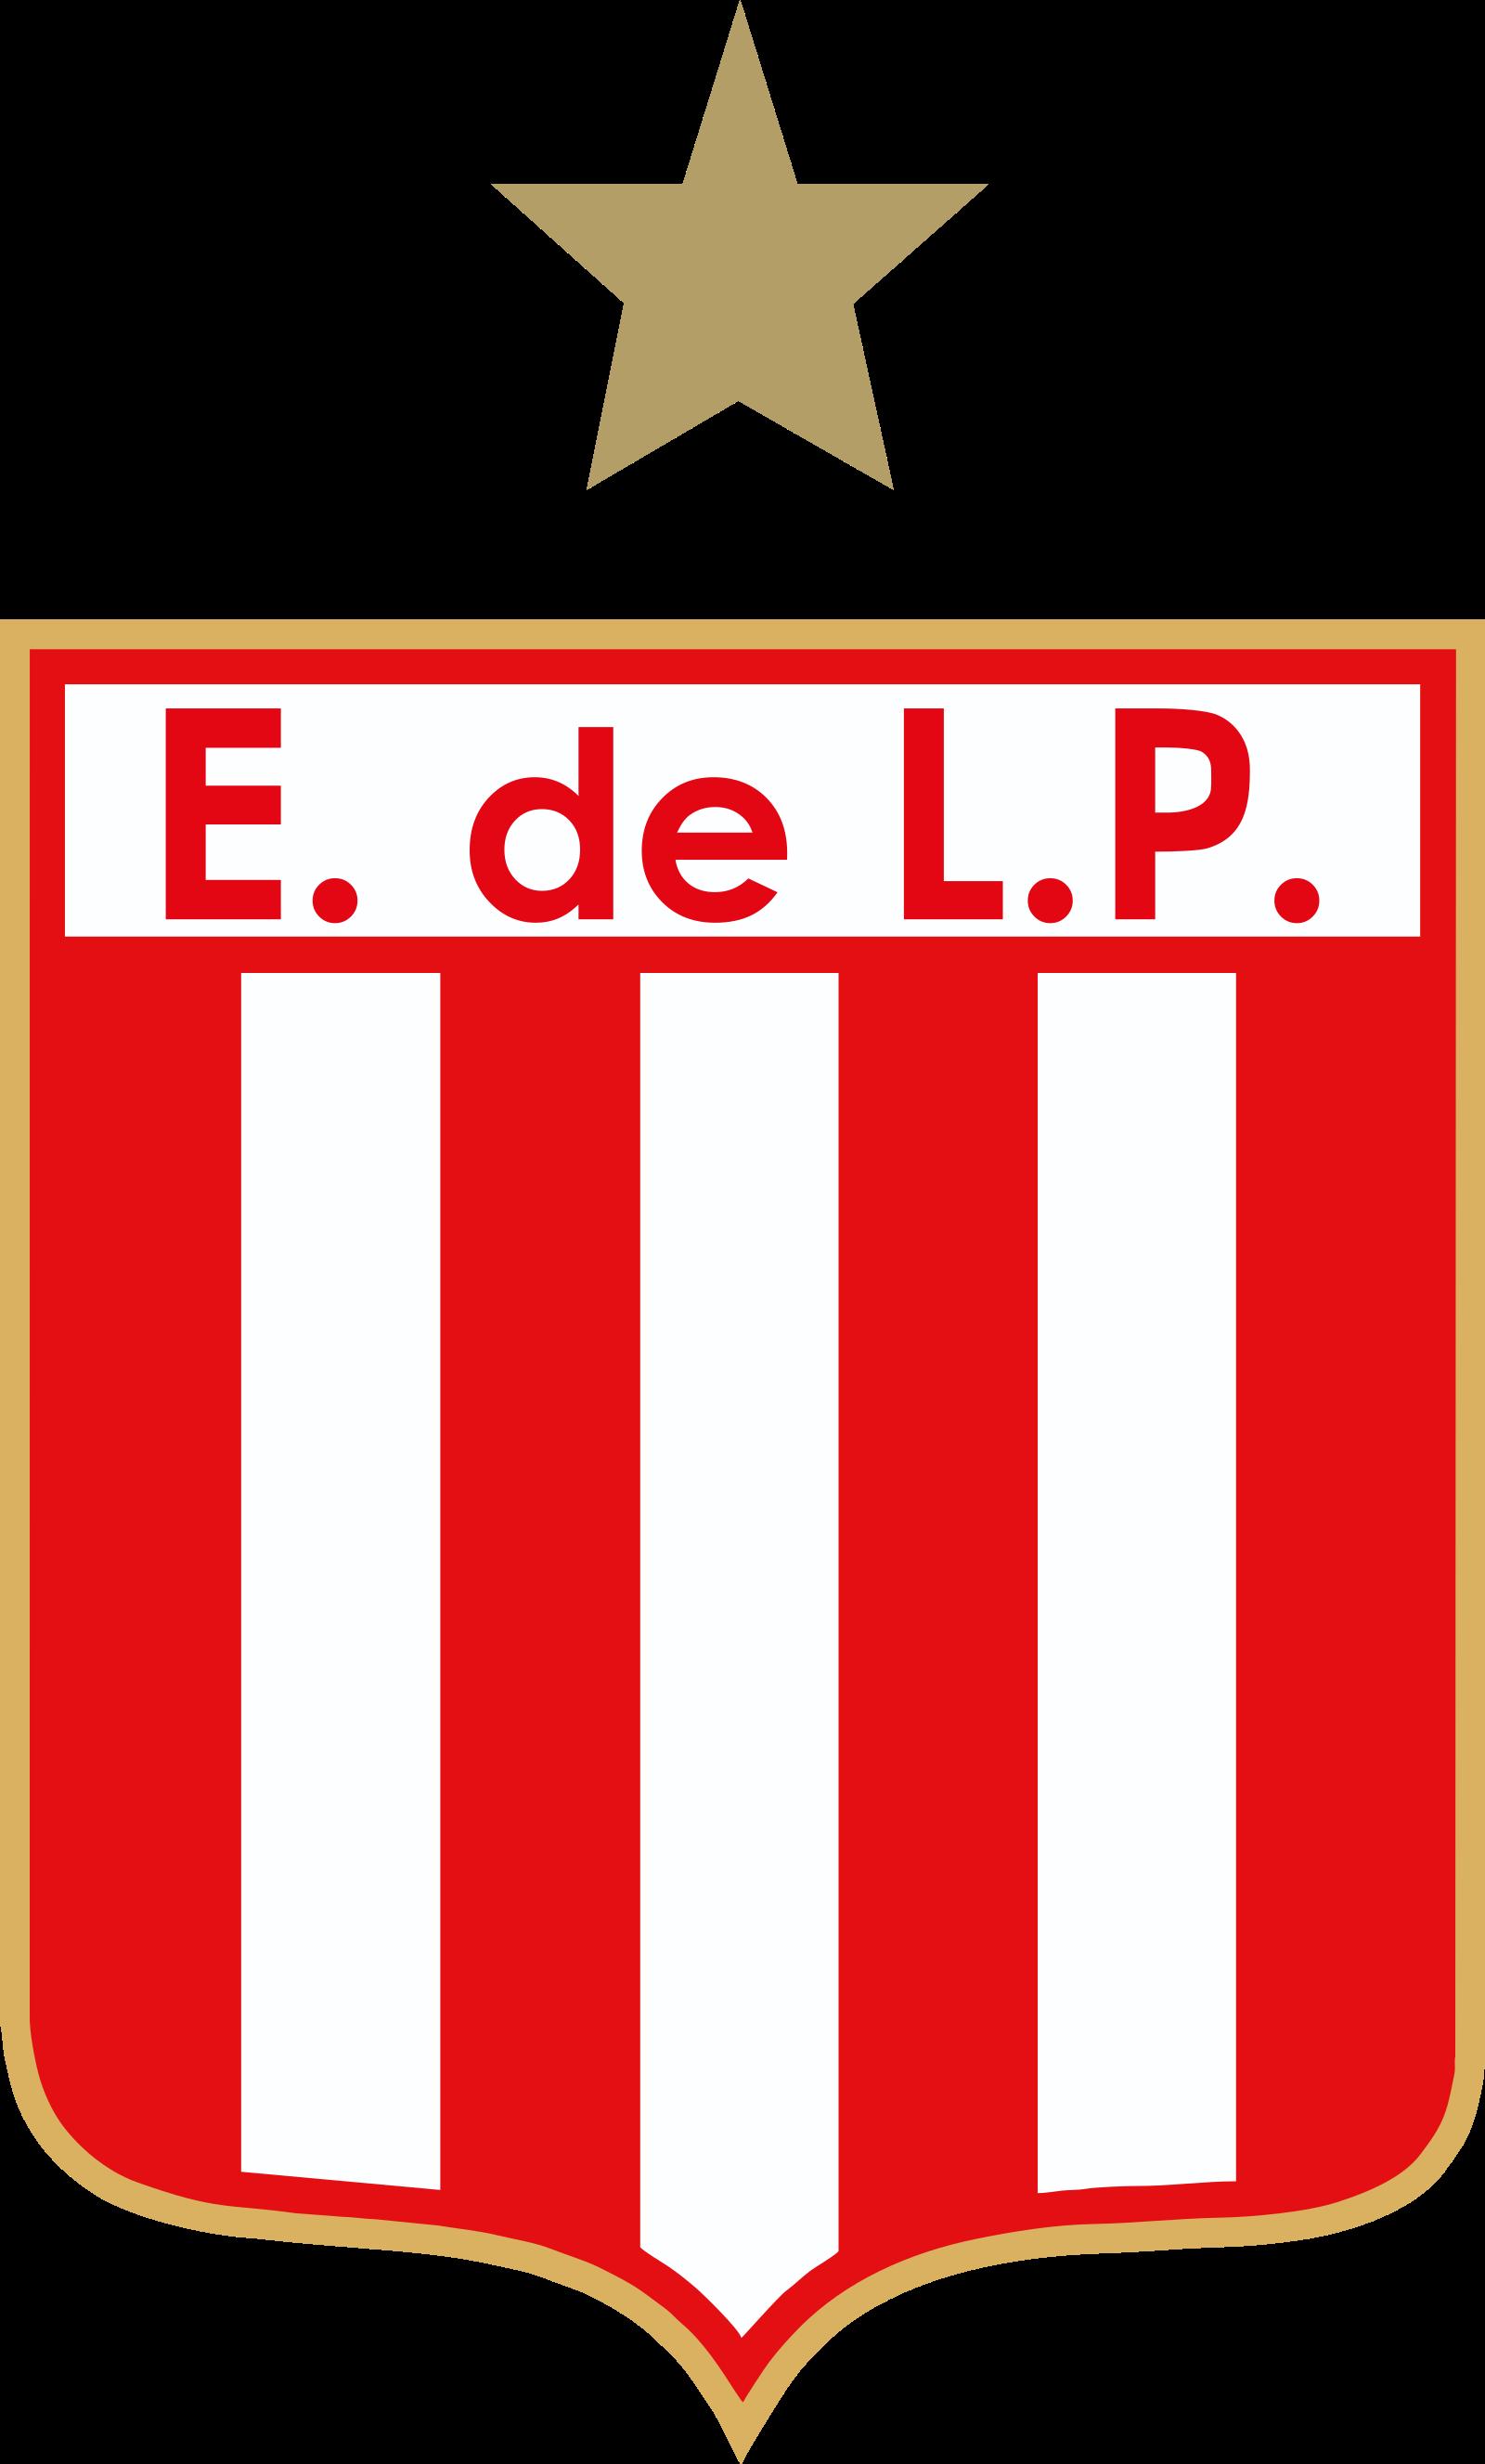 estudiantes logo escudo 5 - Estudiantes de La Plata Logo - Escudo